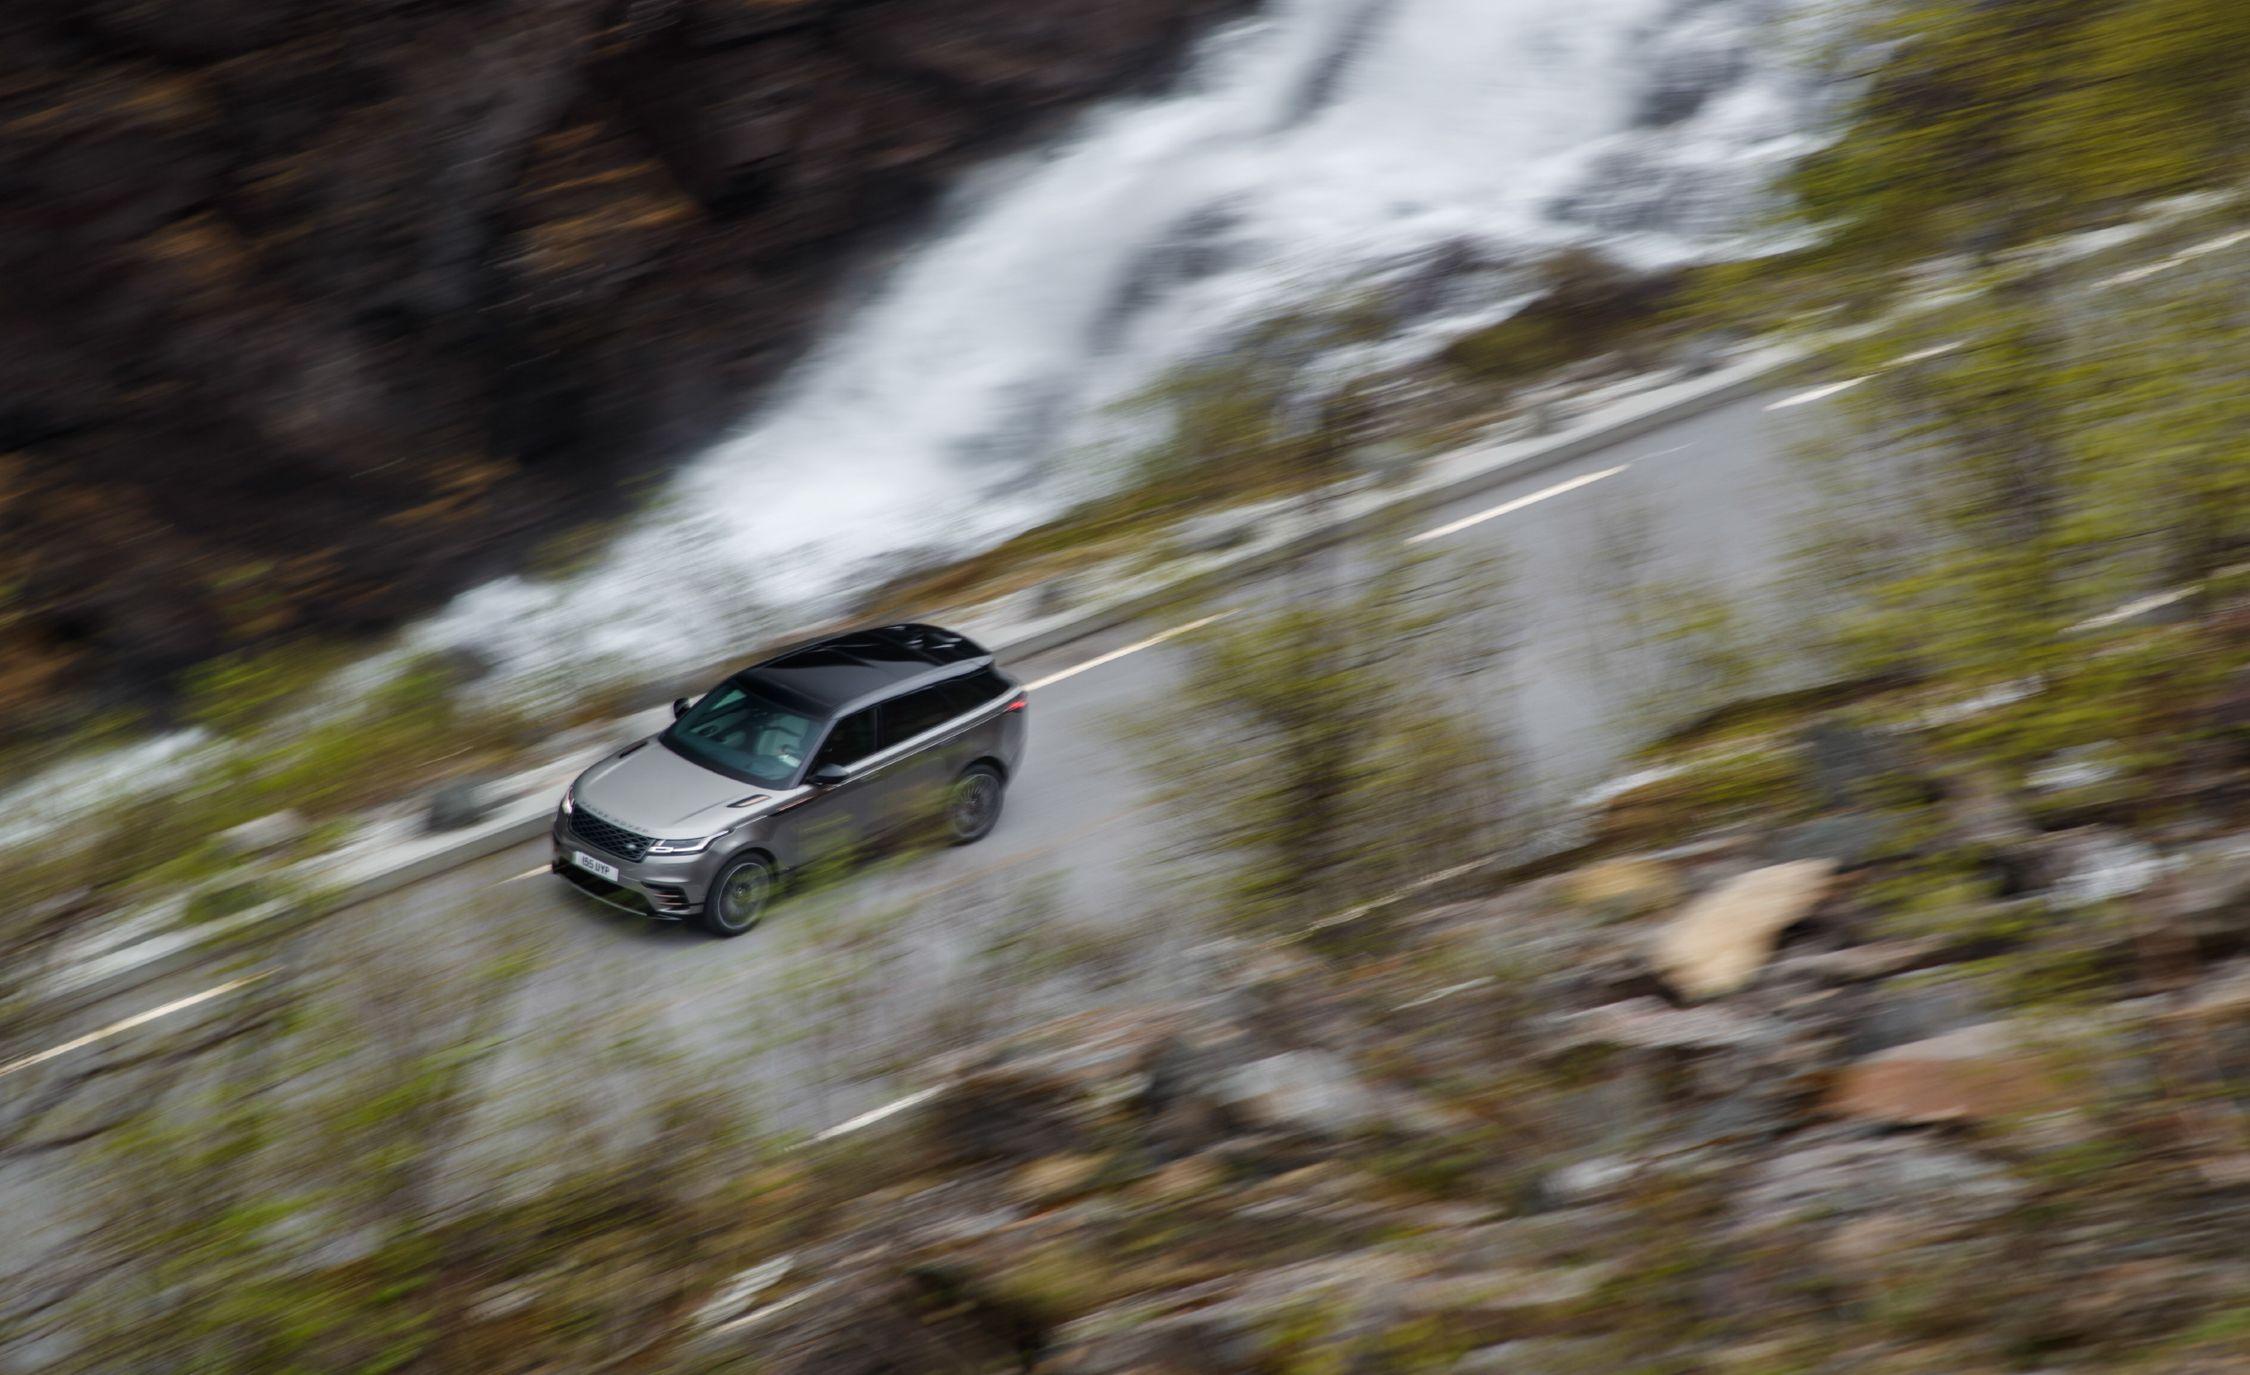 2018 Range Rover Velar Diesel Euro spec – First Drive Review